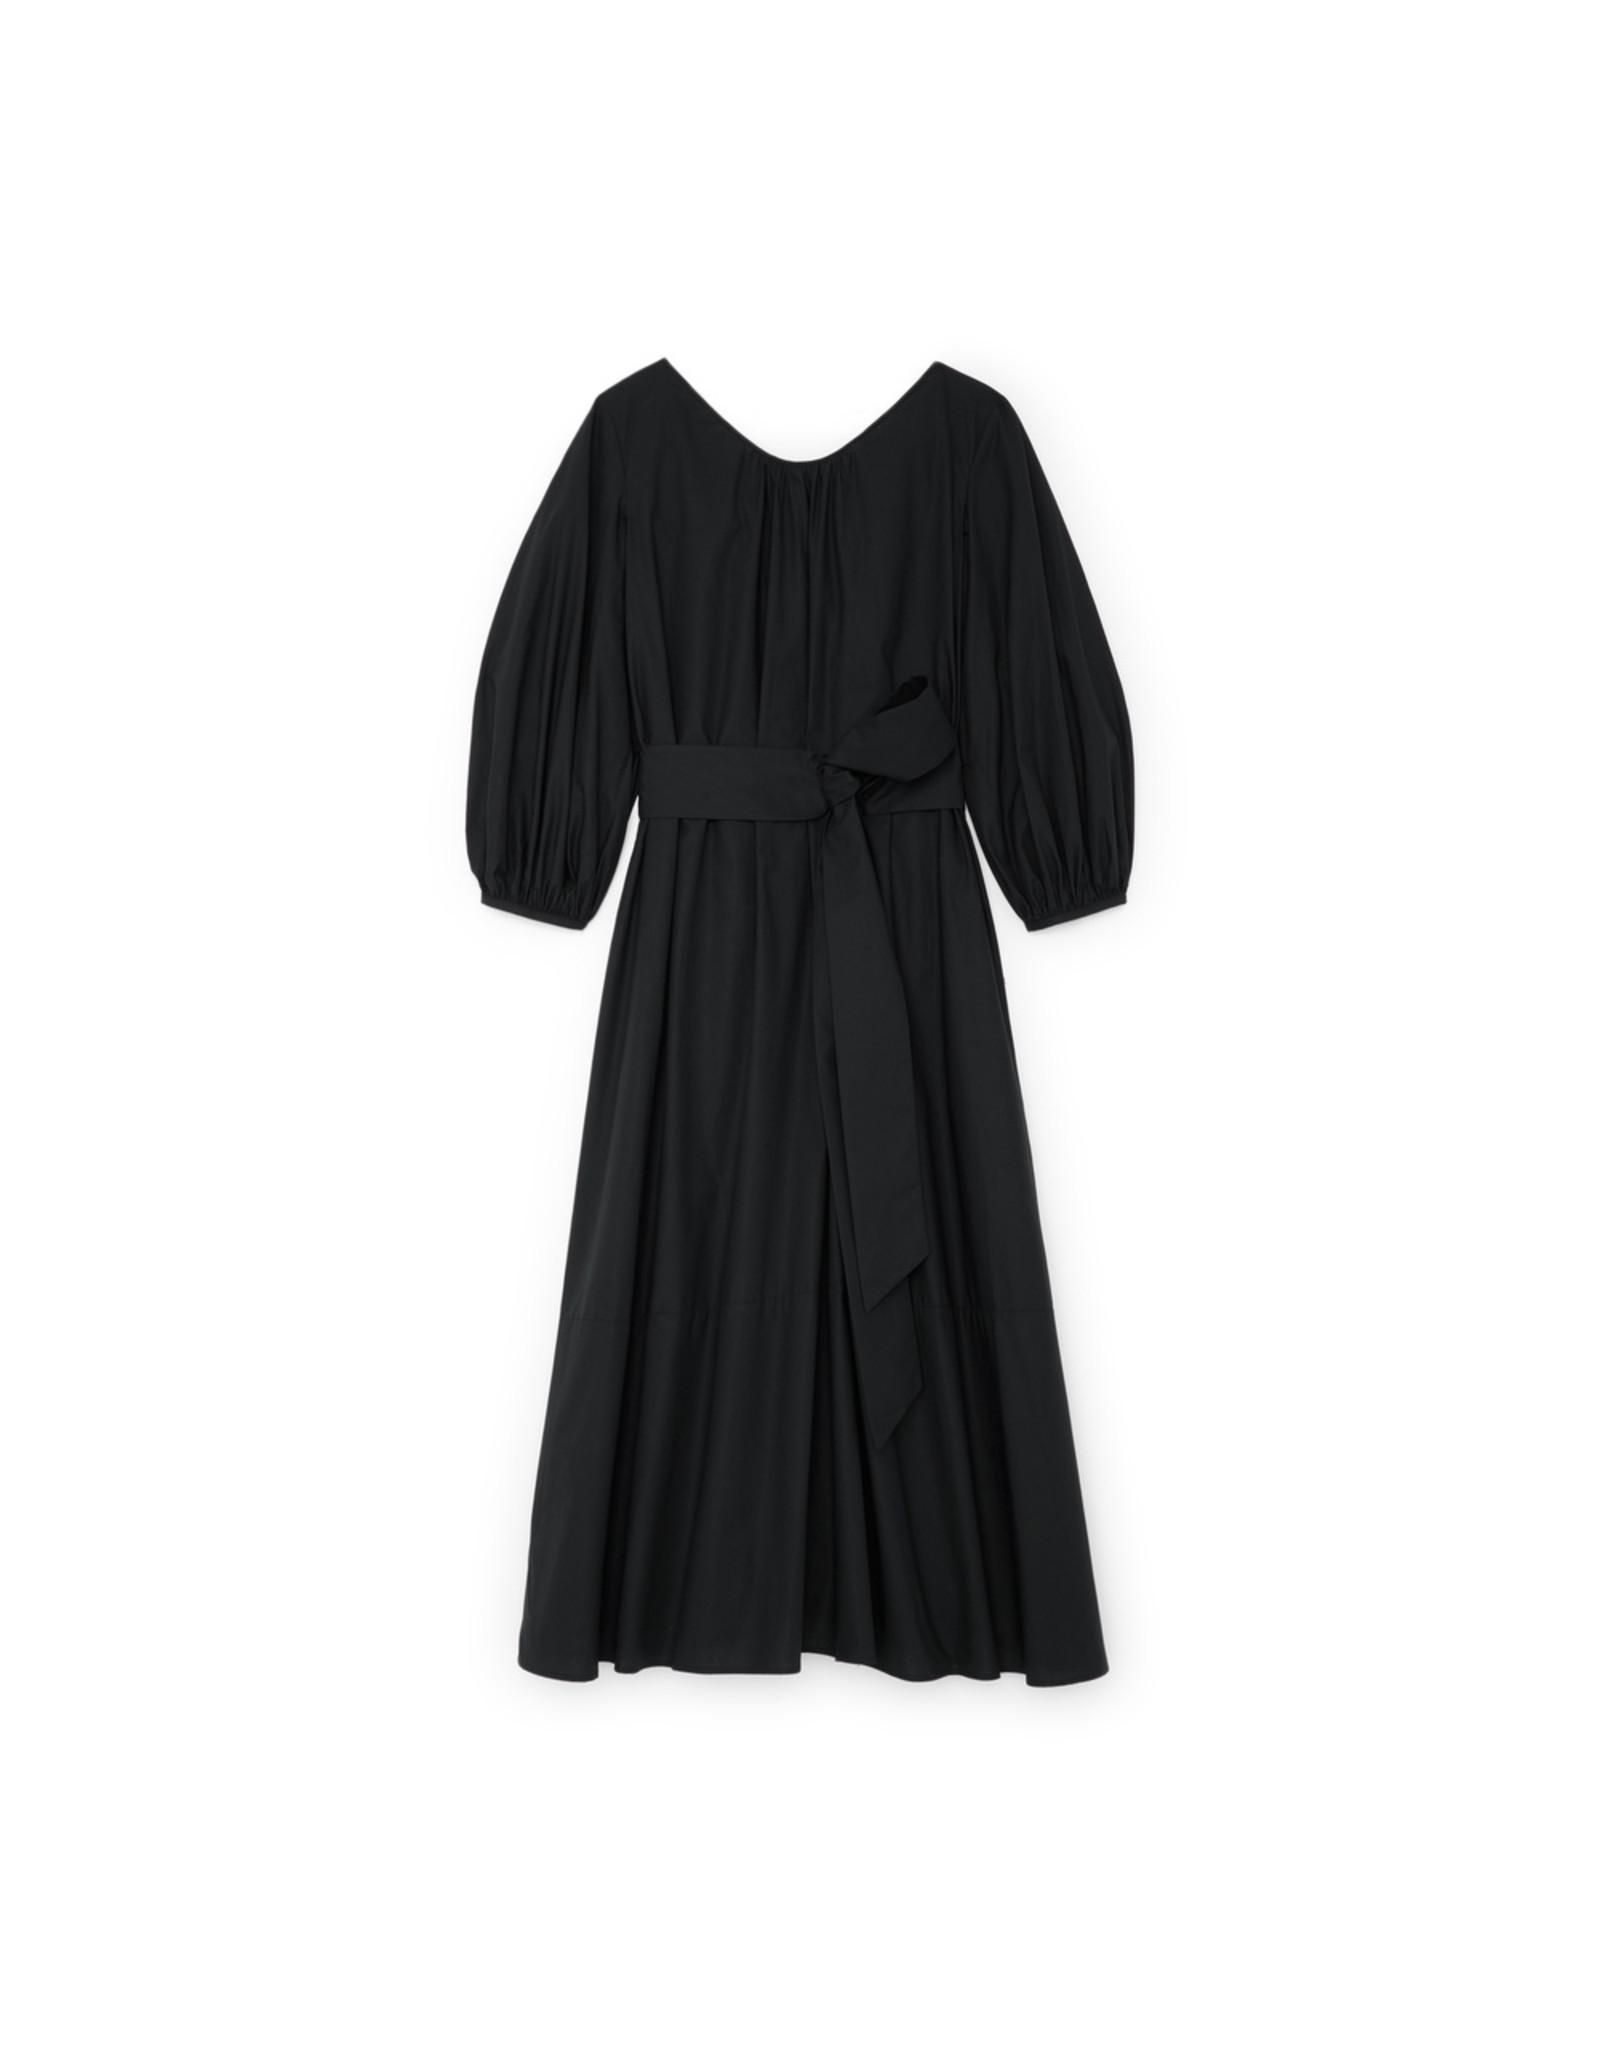 G. Label Amagansett Maxi Dress (Color: Black, Size: L)